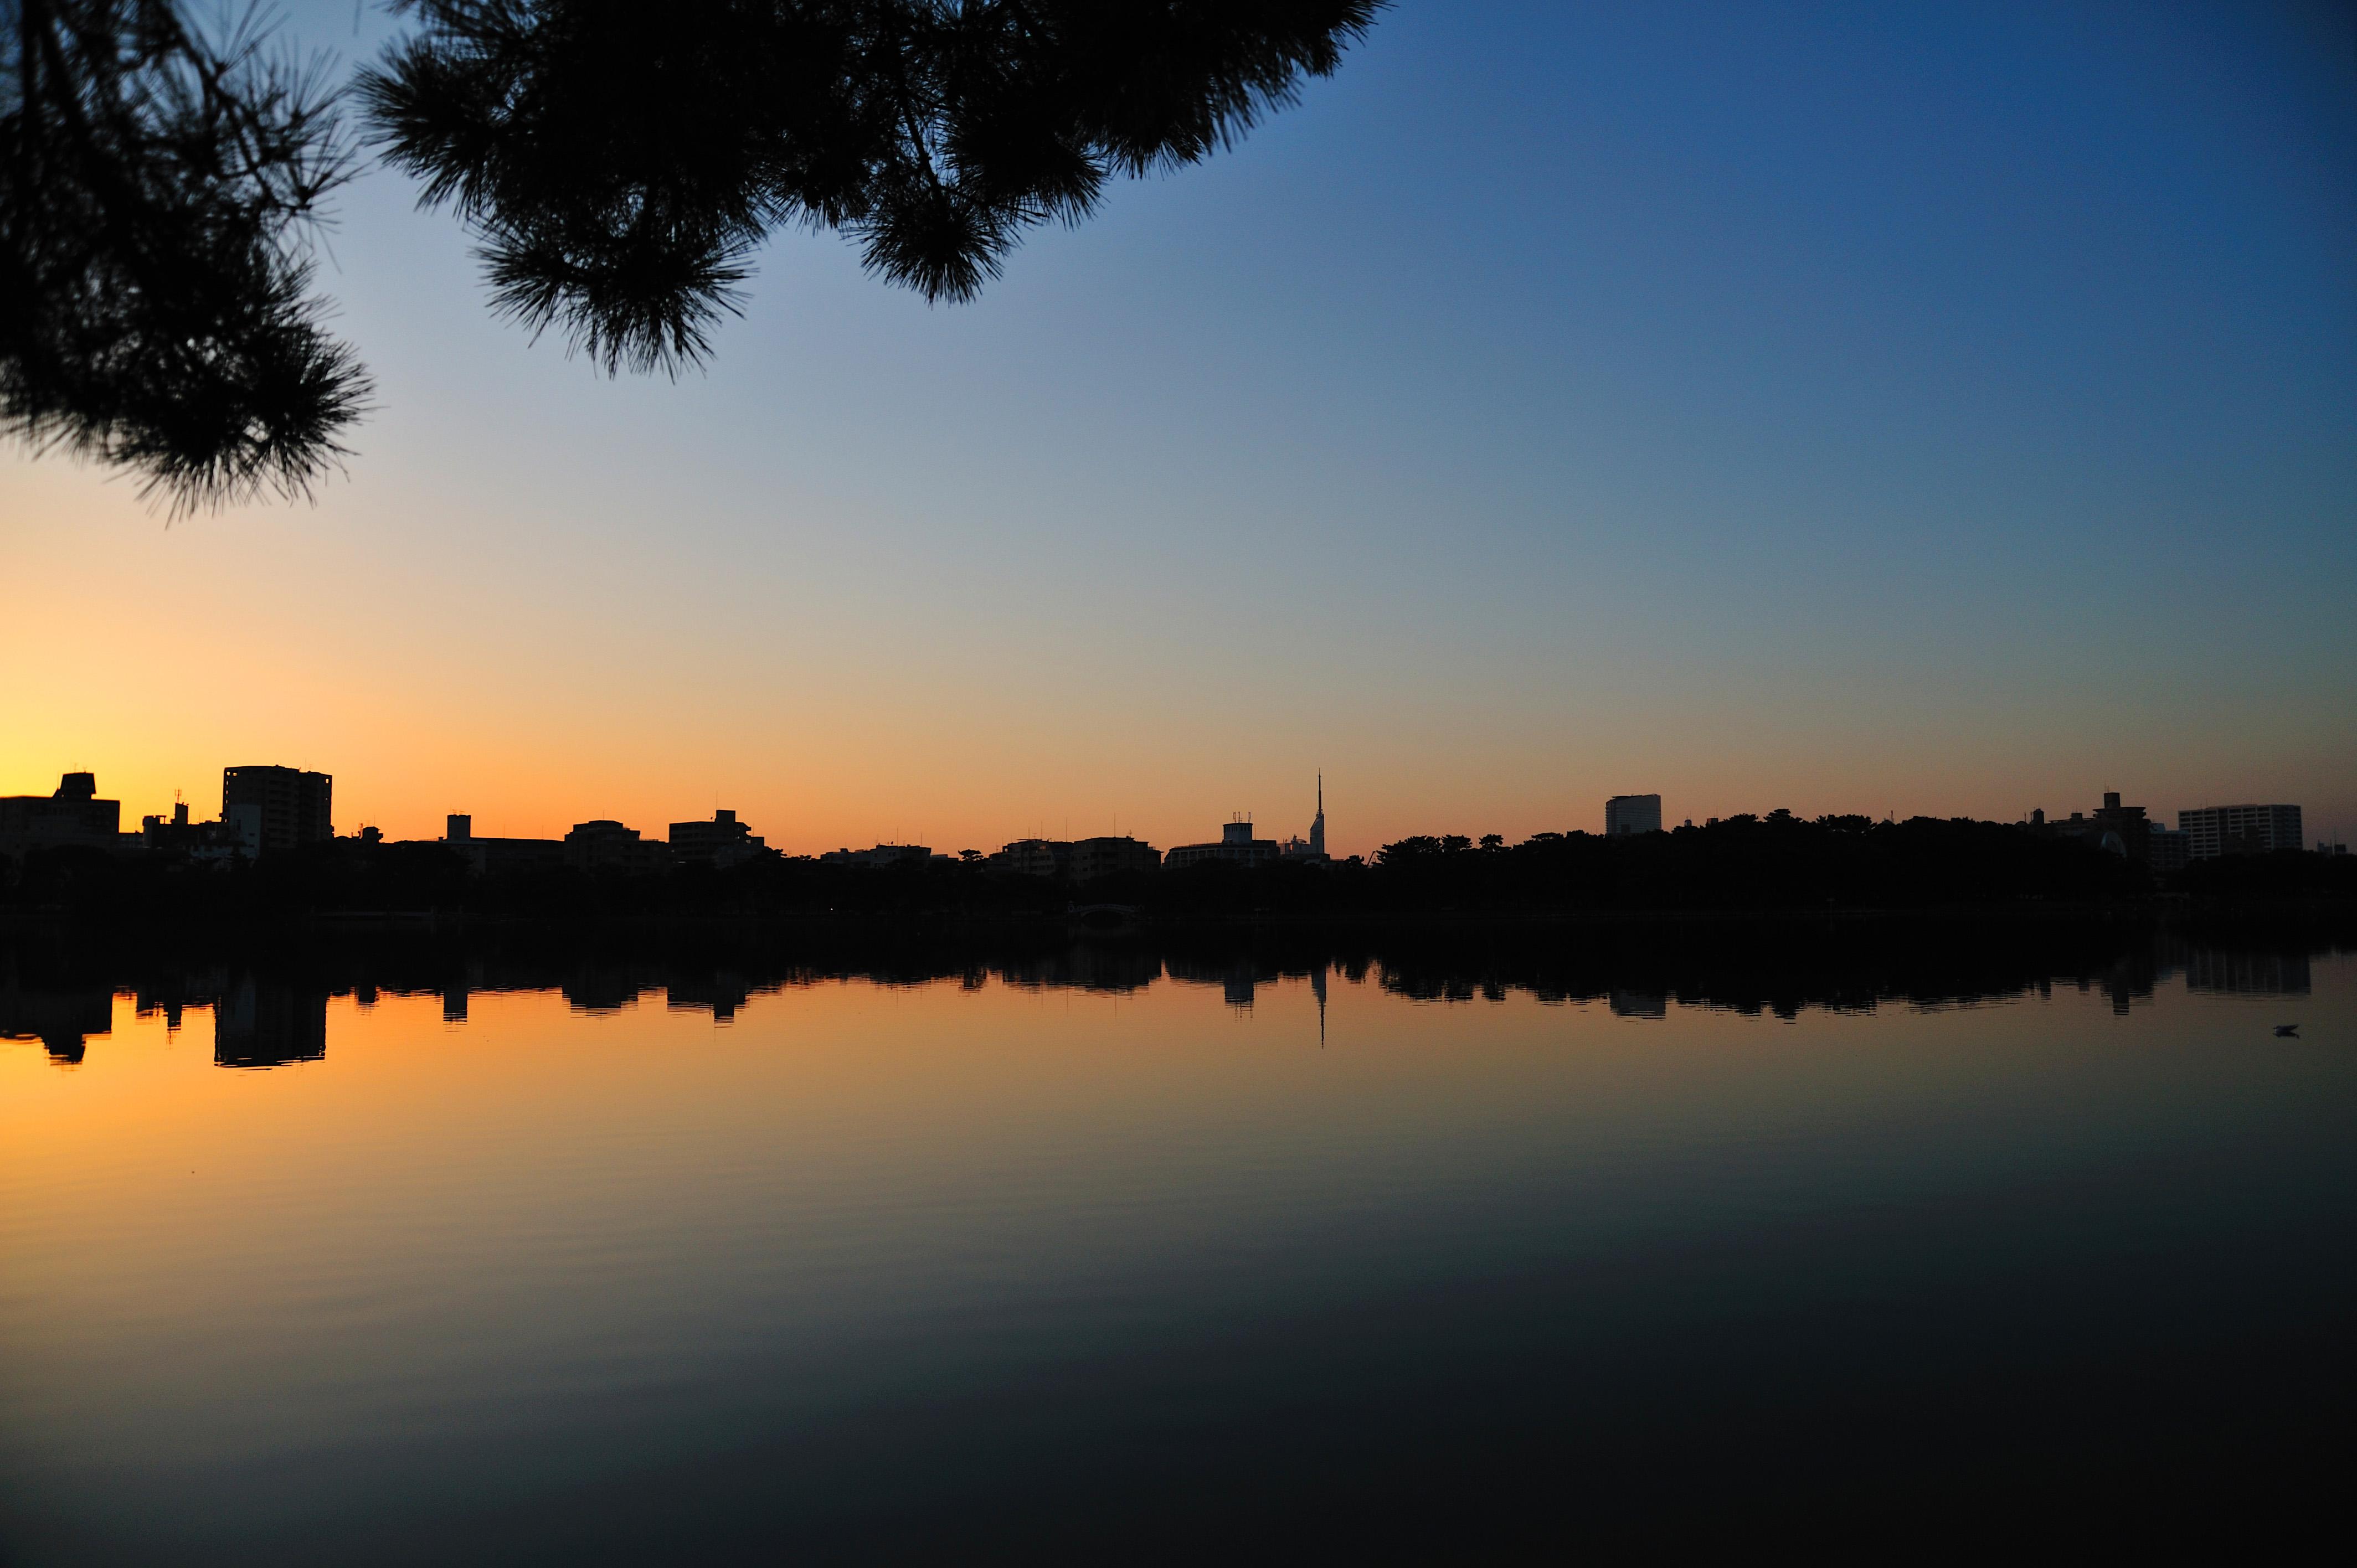 大濠公園夕景(2009)の画像